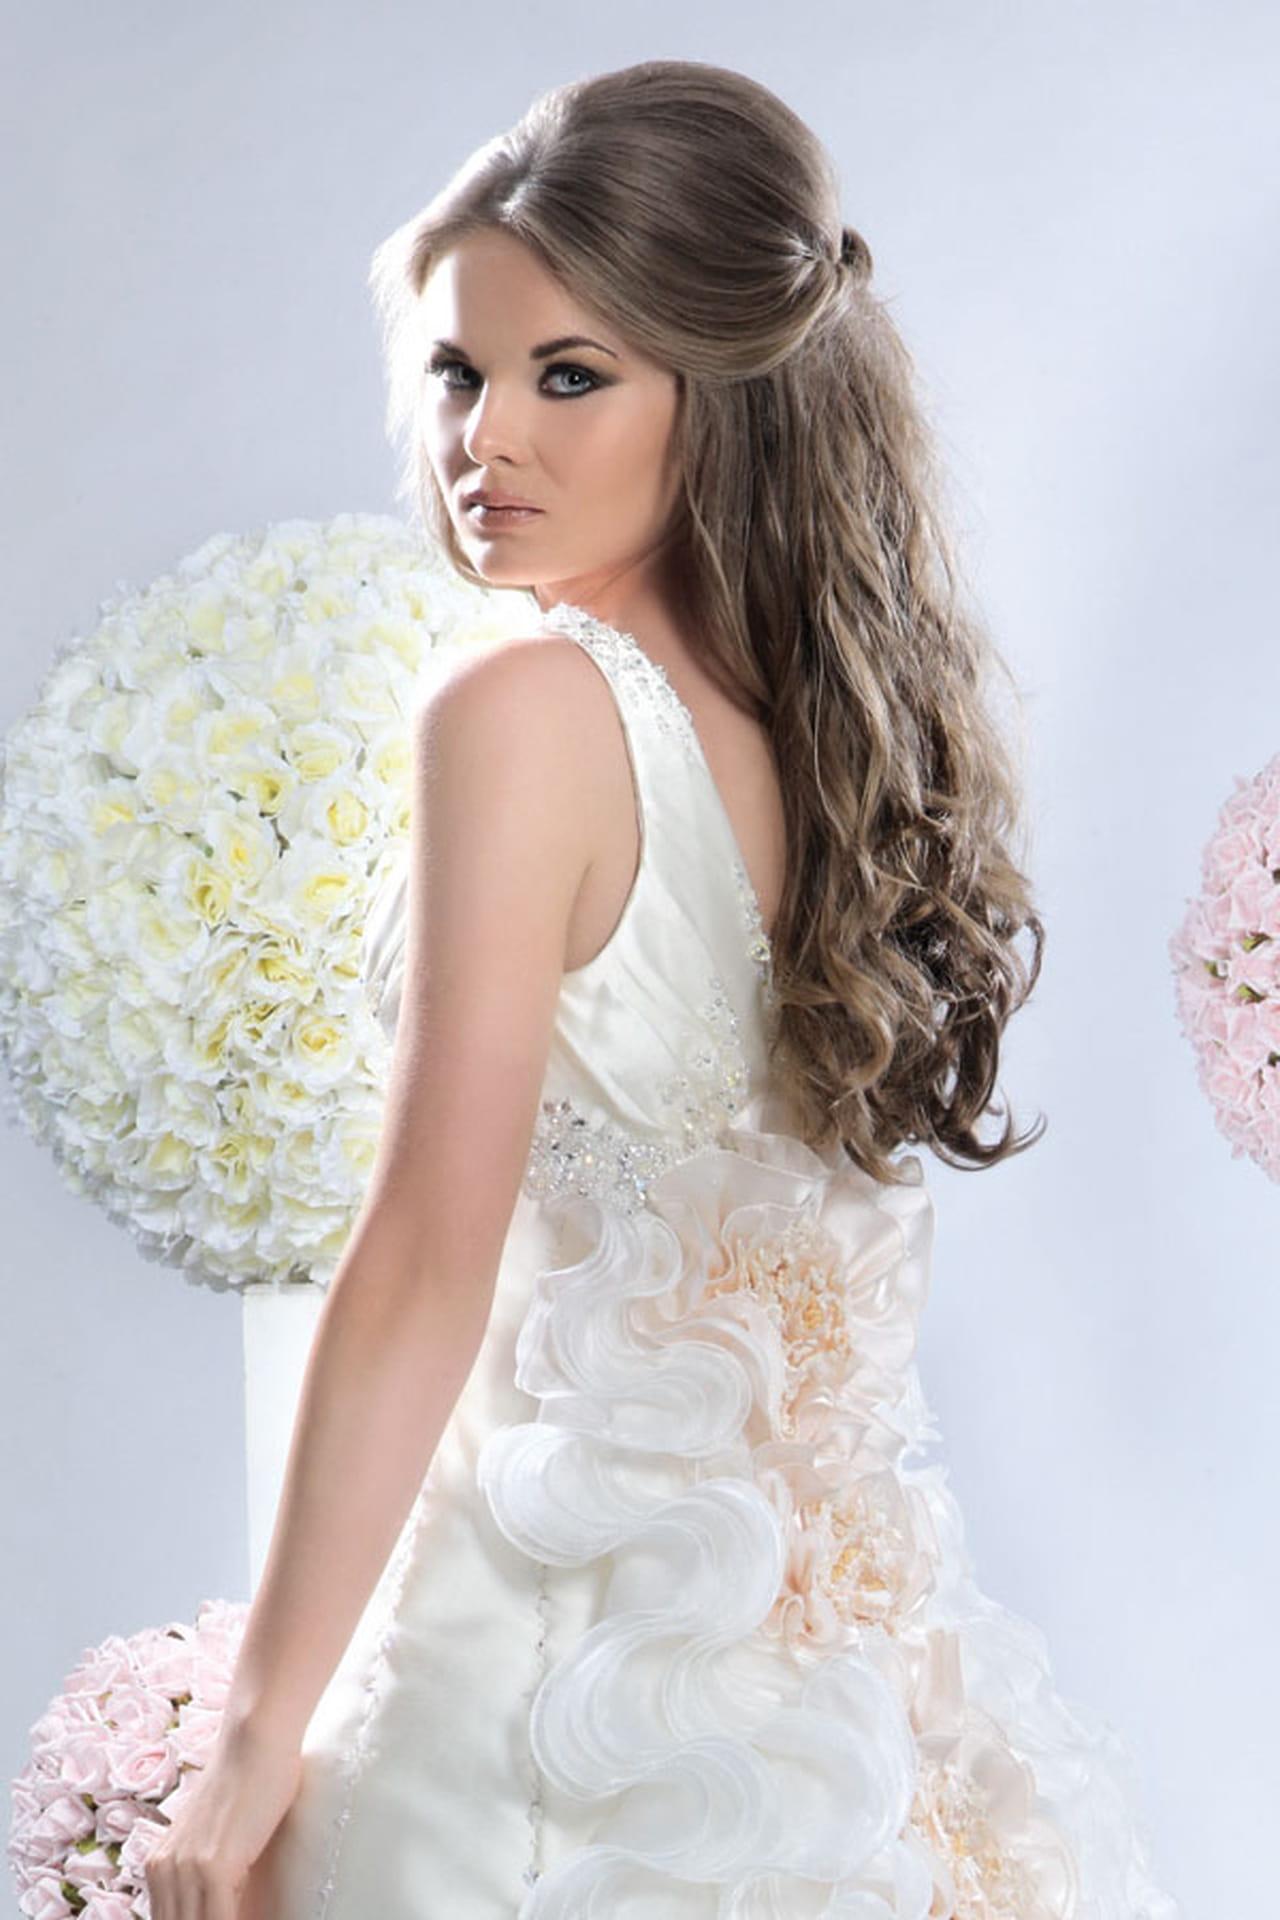 Tonys oldest daughter bianca beets newhairstylesformen2014 com